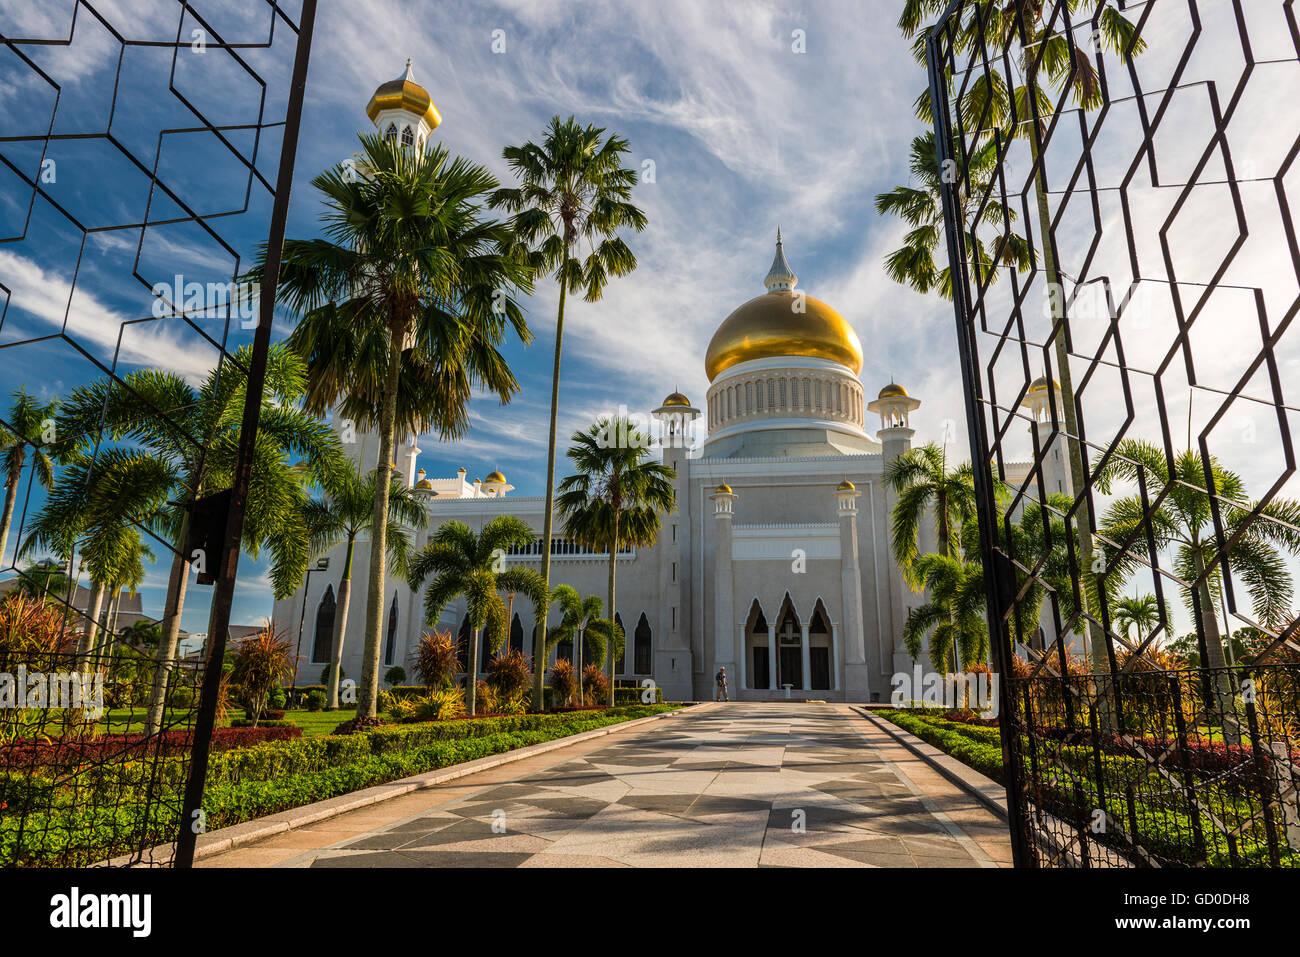 Entering the courtyard of the Sultan Omar Ali Saifuddin Mosque in Bandar Seri Begawan, Brunei. - Stock Image